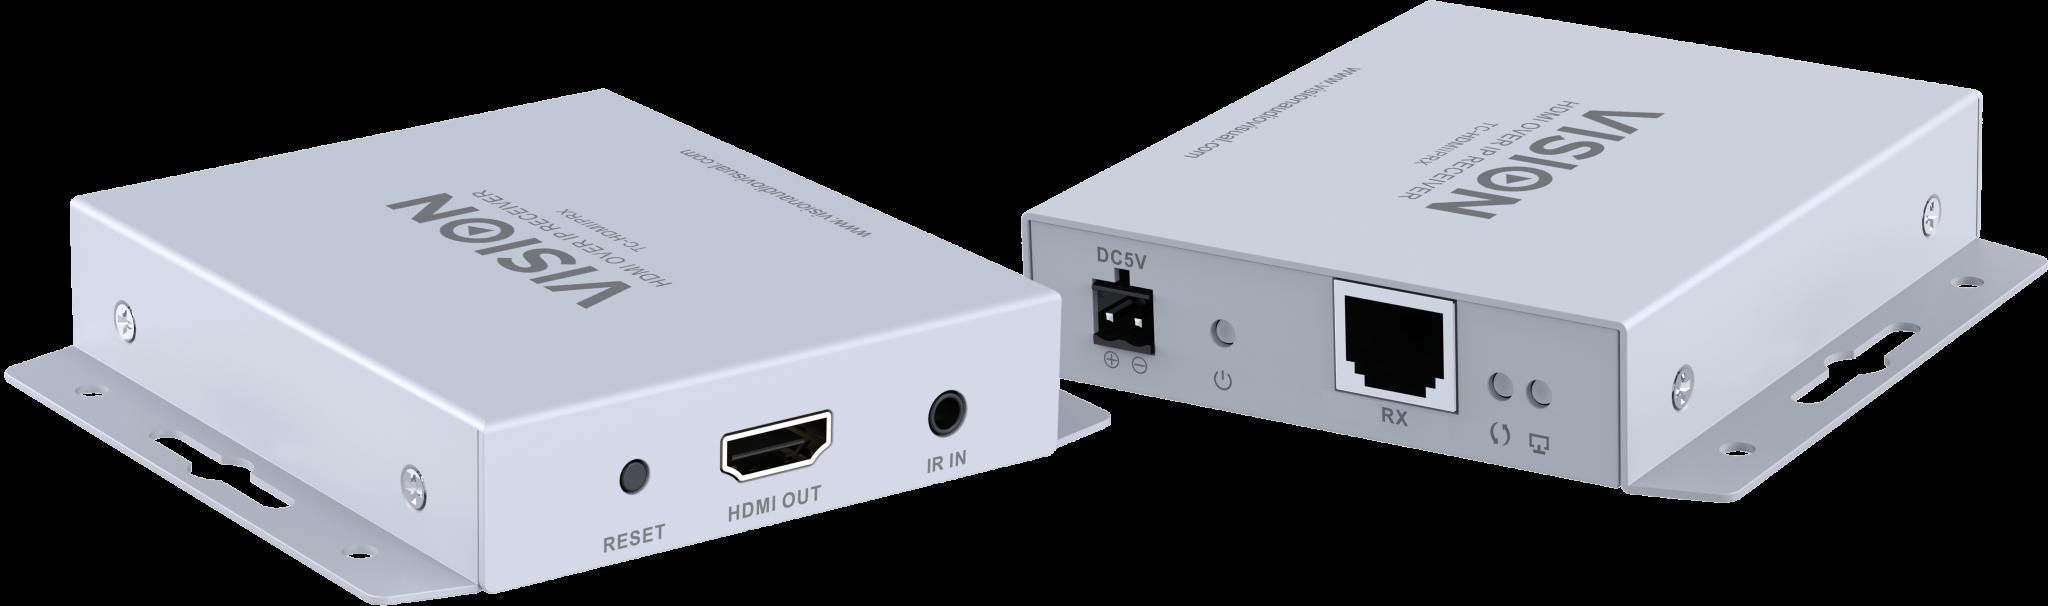 TC-HDMIIP Digital Signage HDMI-over-IP | Vision Audio Visual